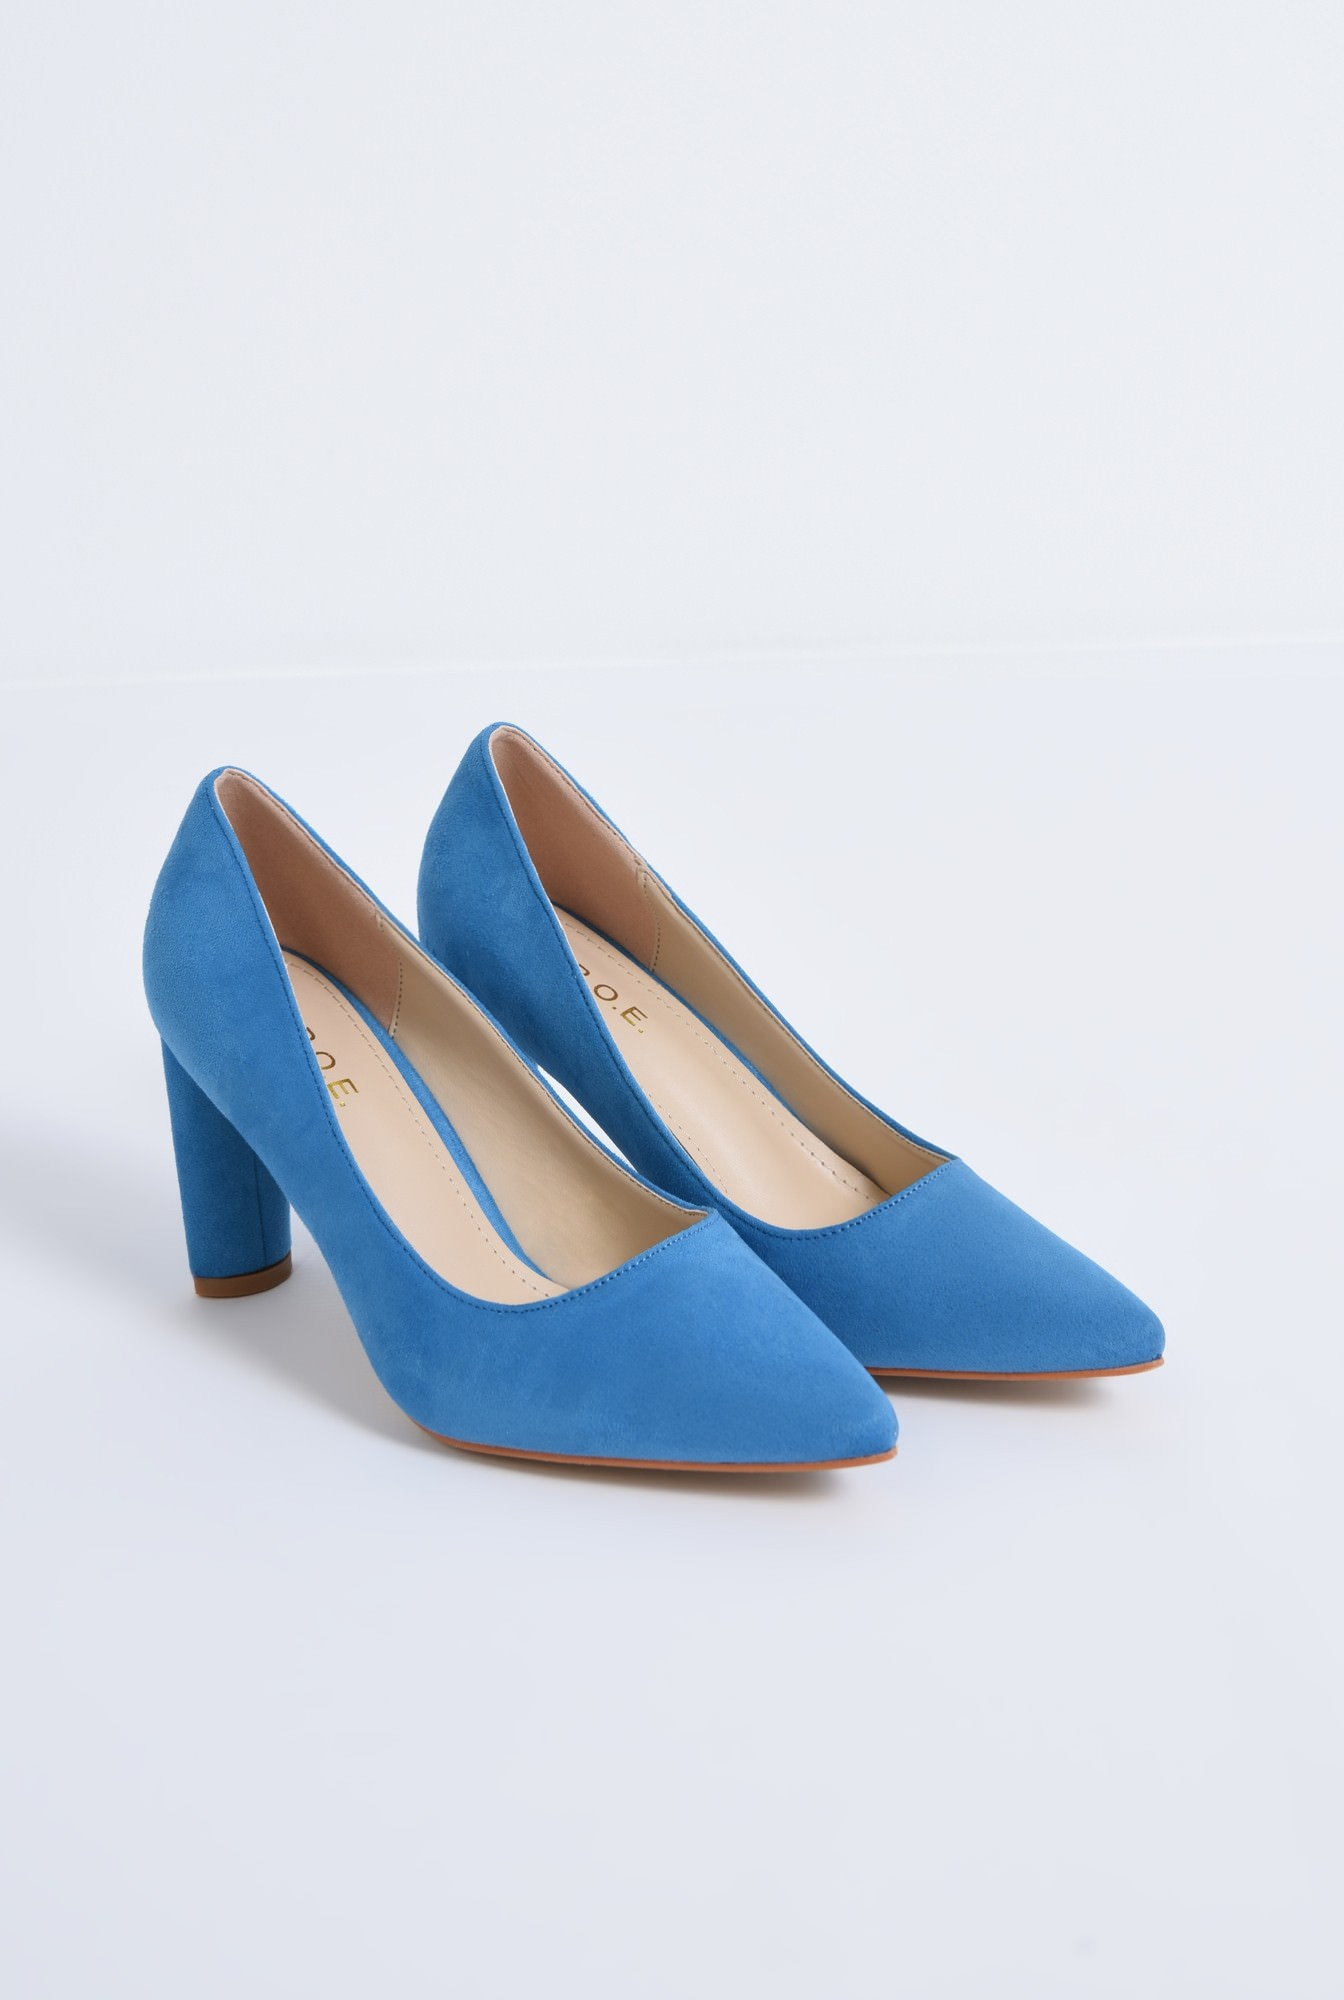 1 - pantofi casual, bleu, toc drept, piele intoarsa